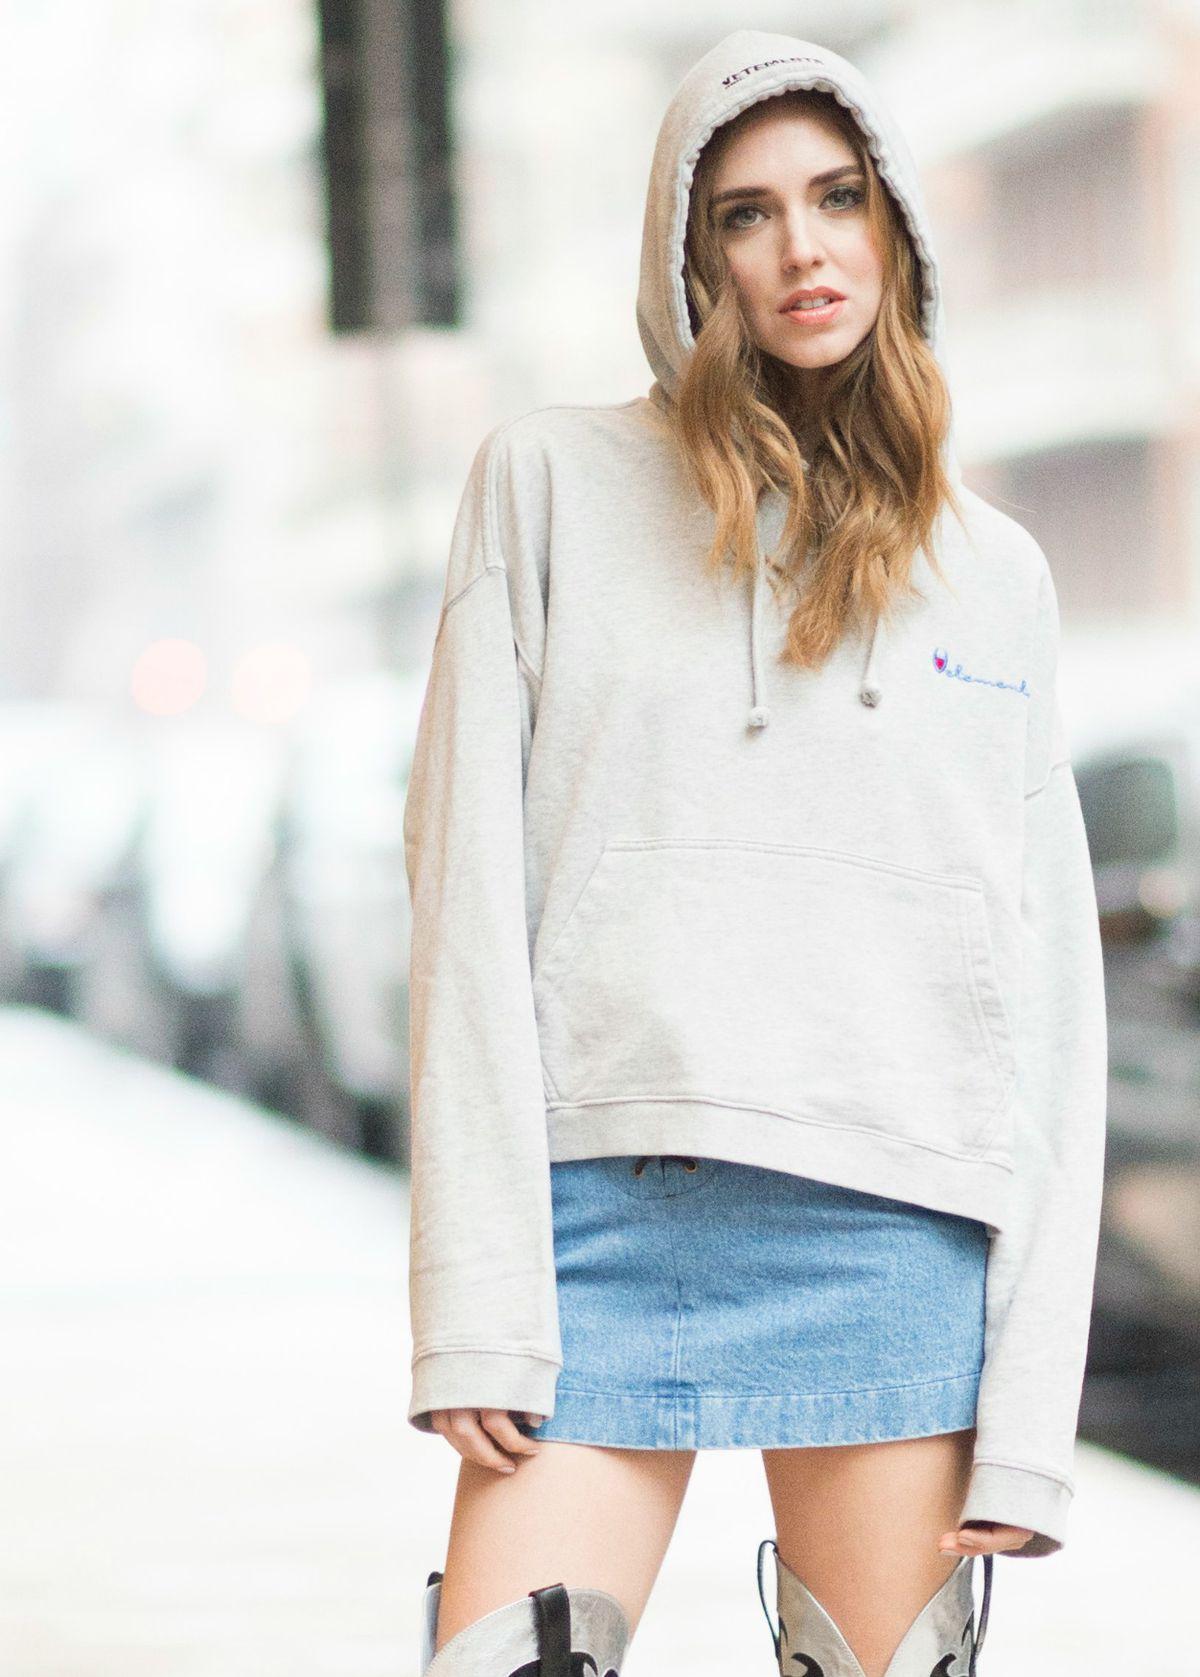 Blogger Chiara Ferragni wearing Vetements' Champion-style logo sweatshirt